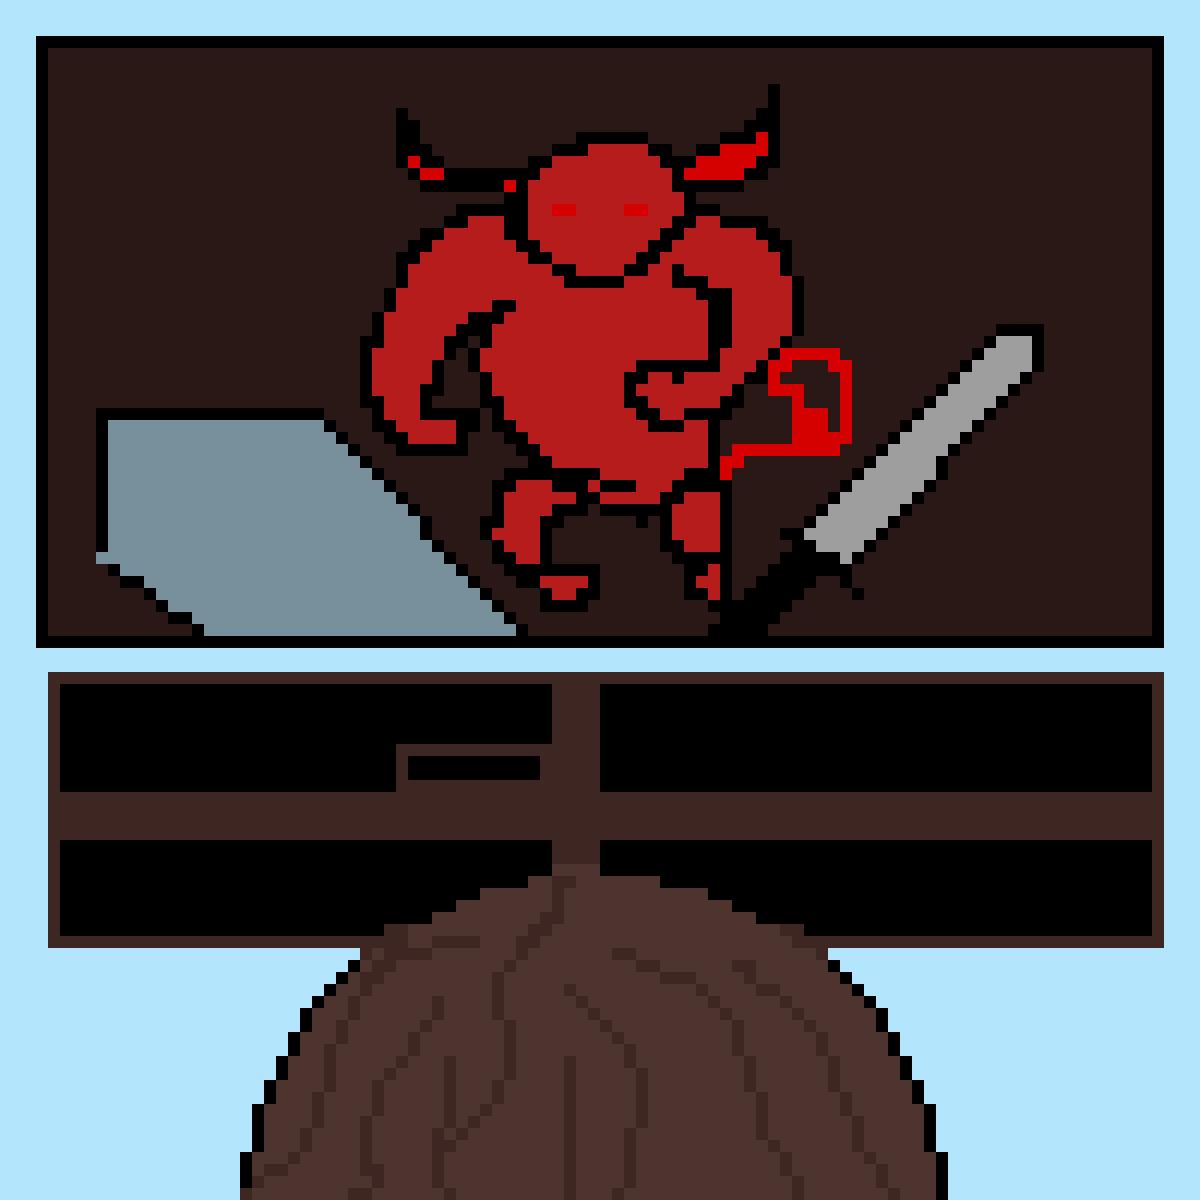 Knight vs Demon game